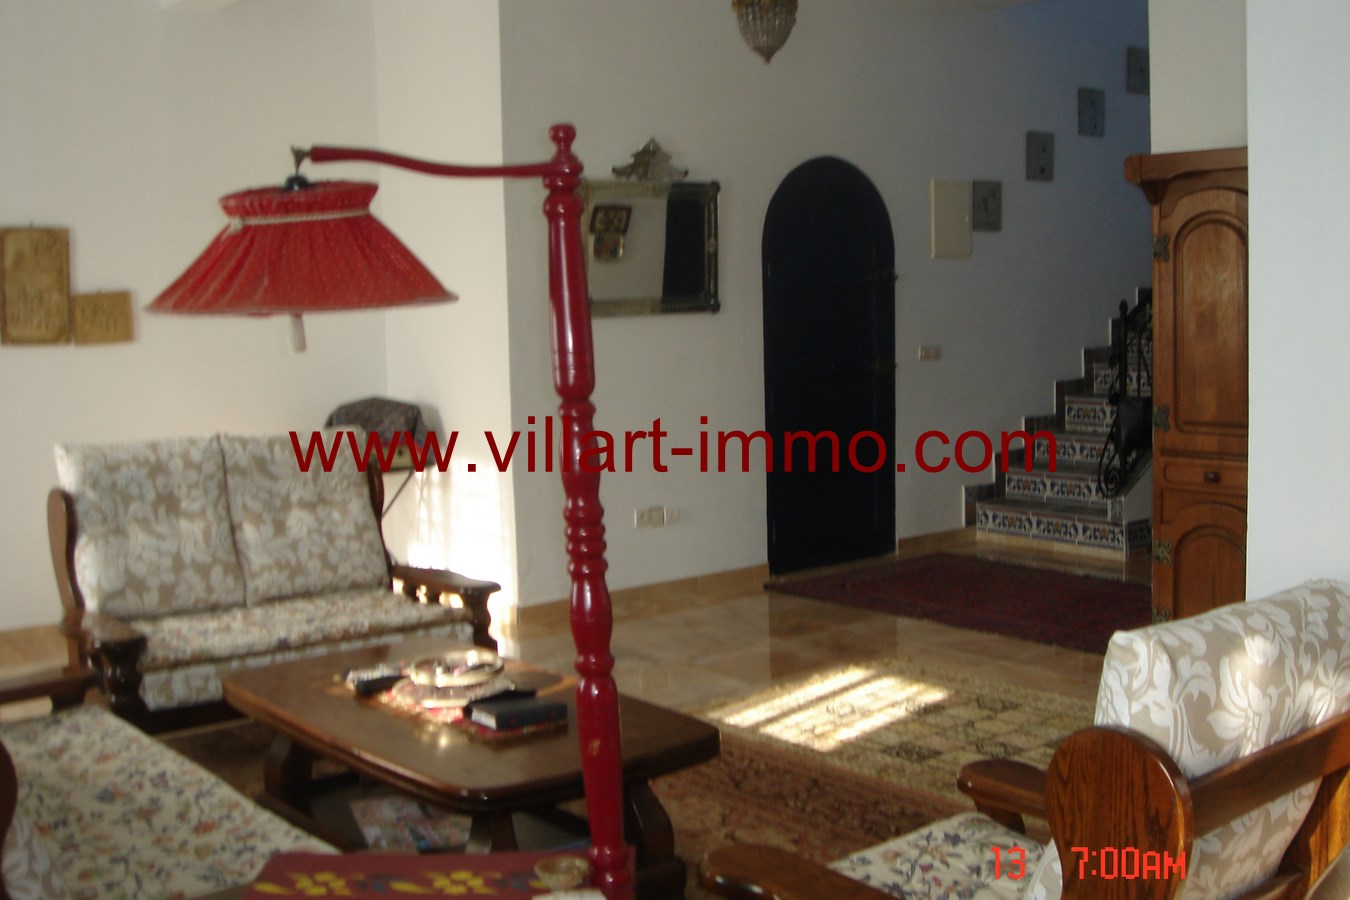 2-a-vendre-villa-tanger-hijriyin-salon-vv430-villart-immo